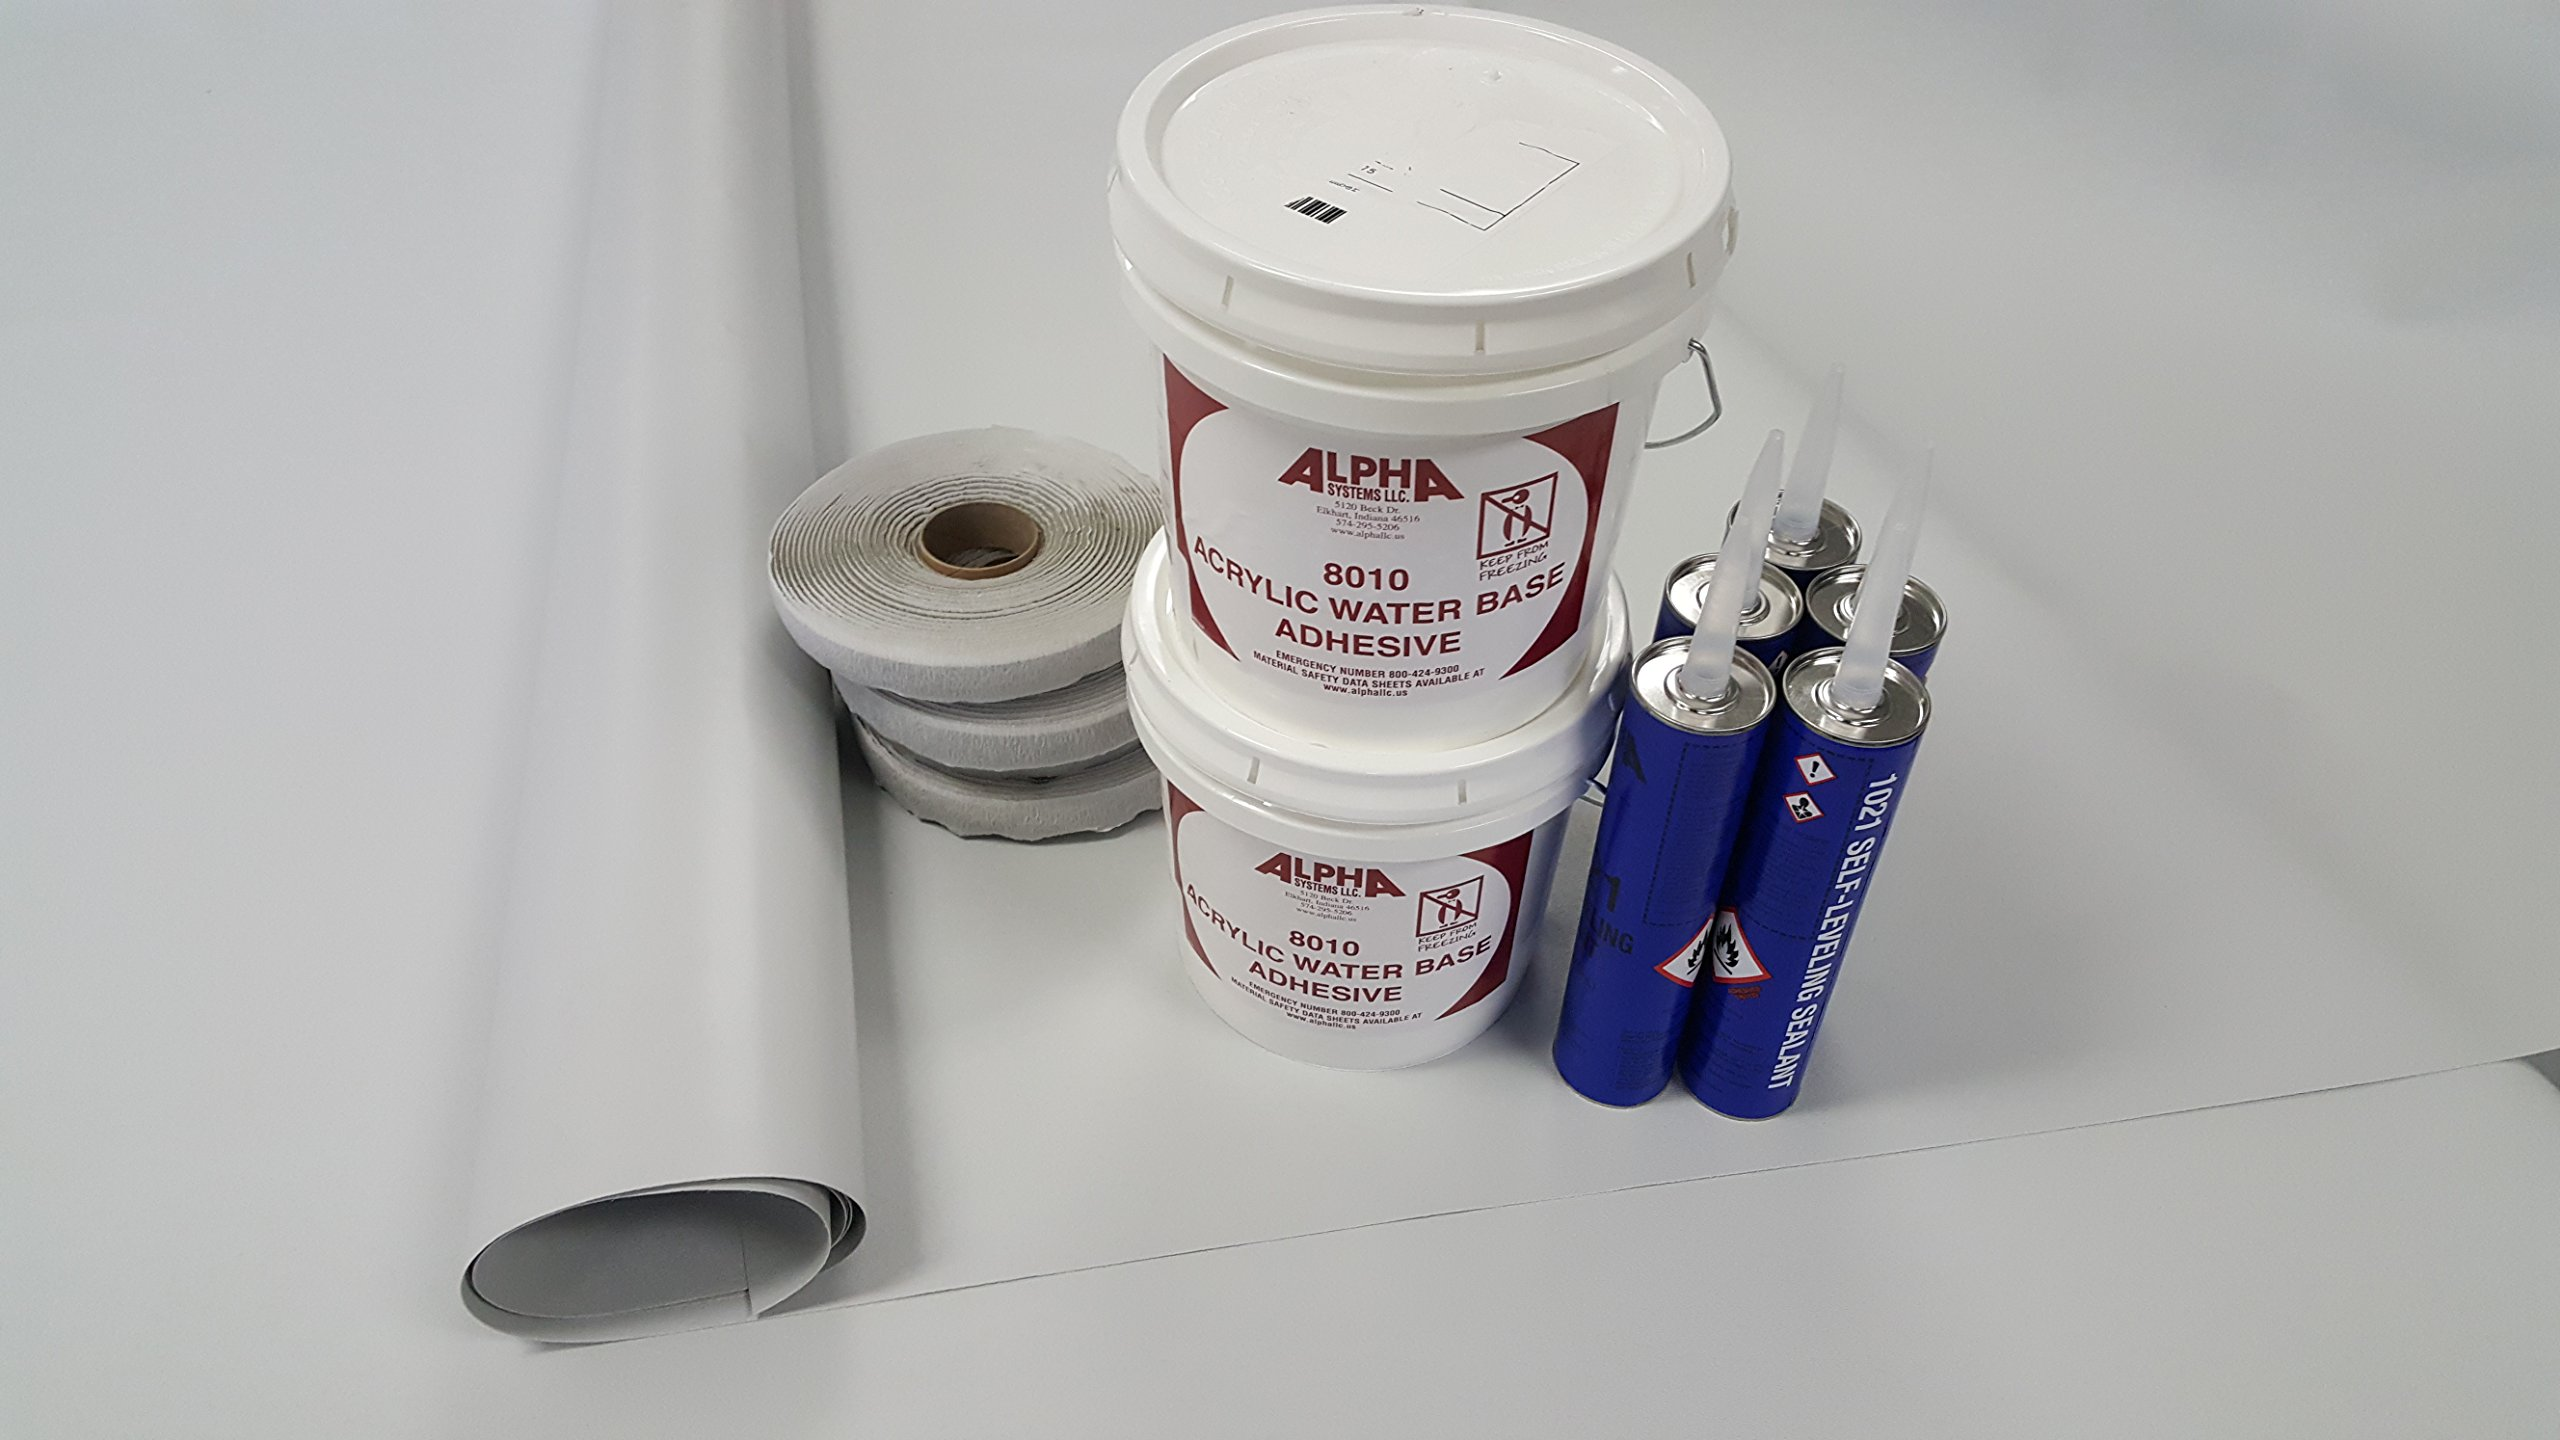 Superflex RV Rubber Roof Kit 9.5' X 35' Complete Kit